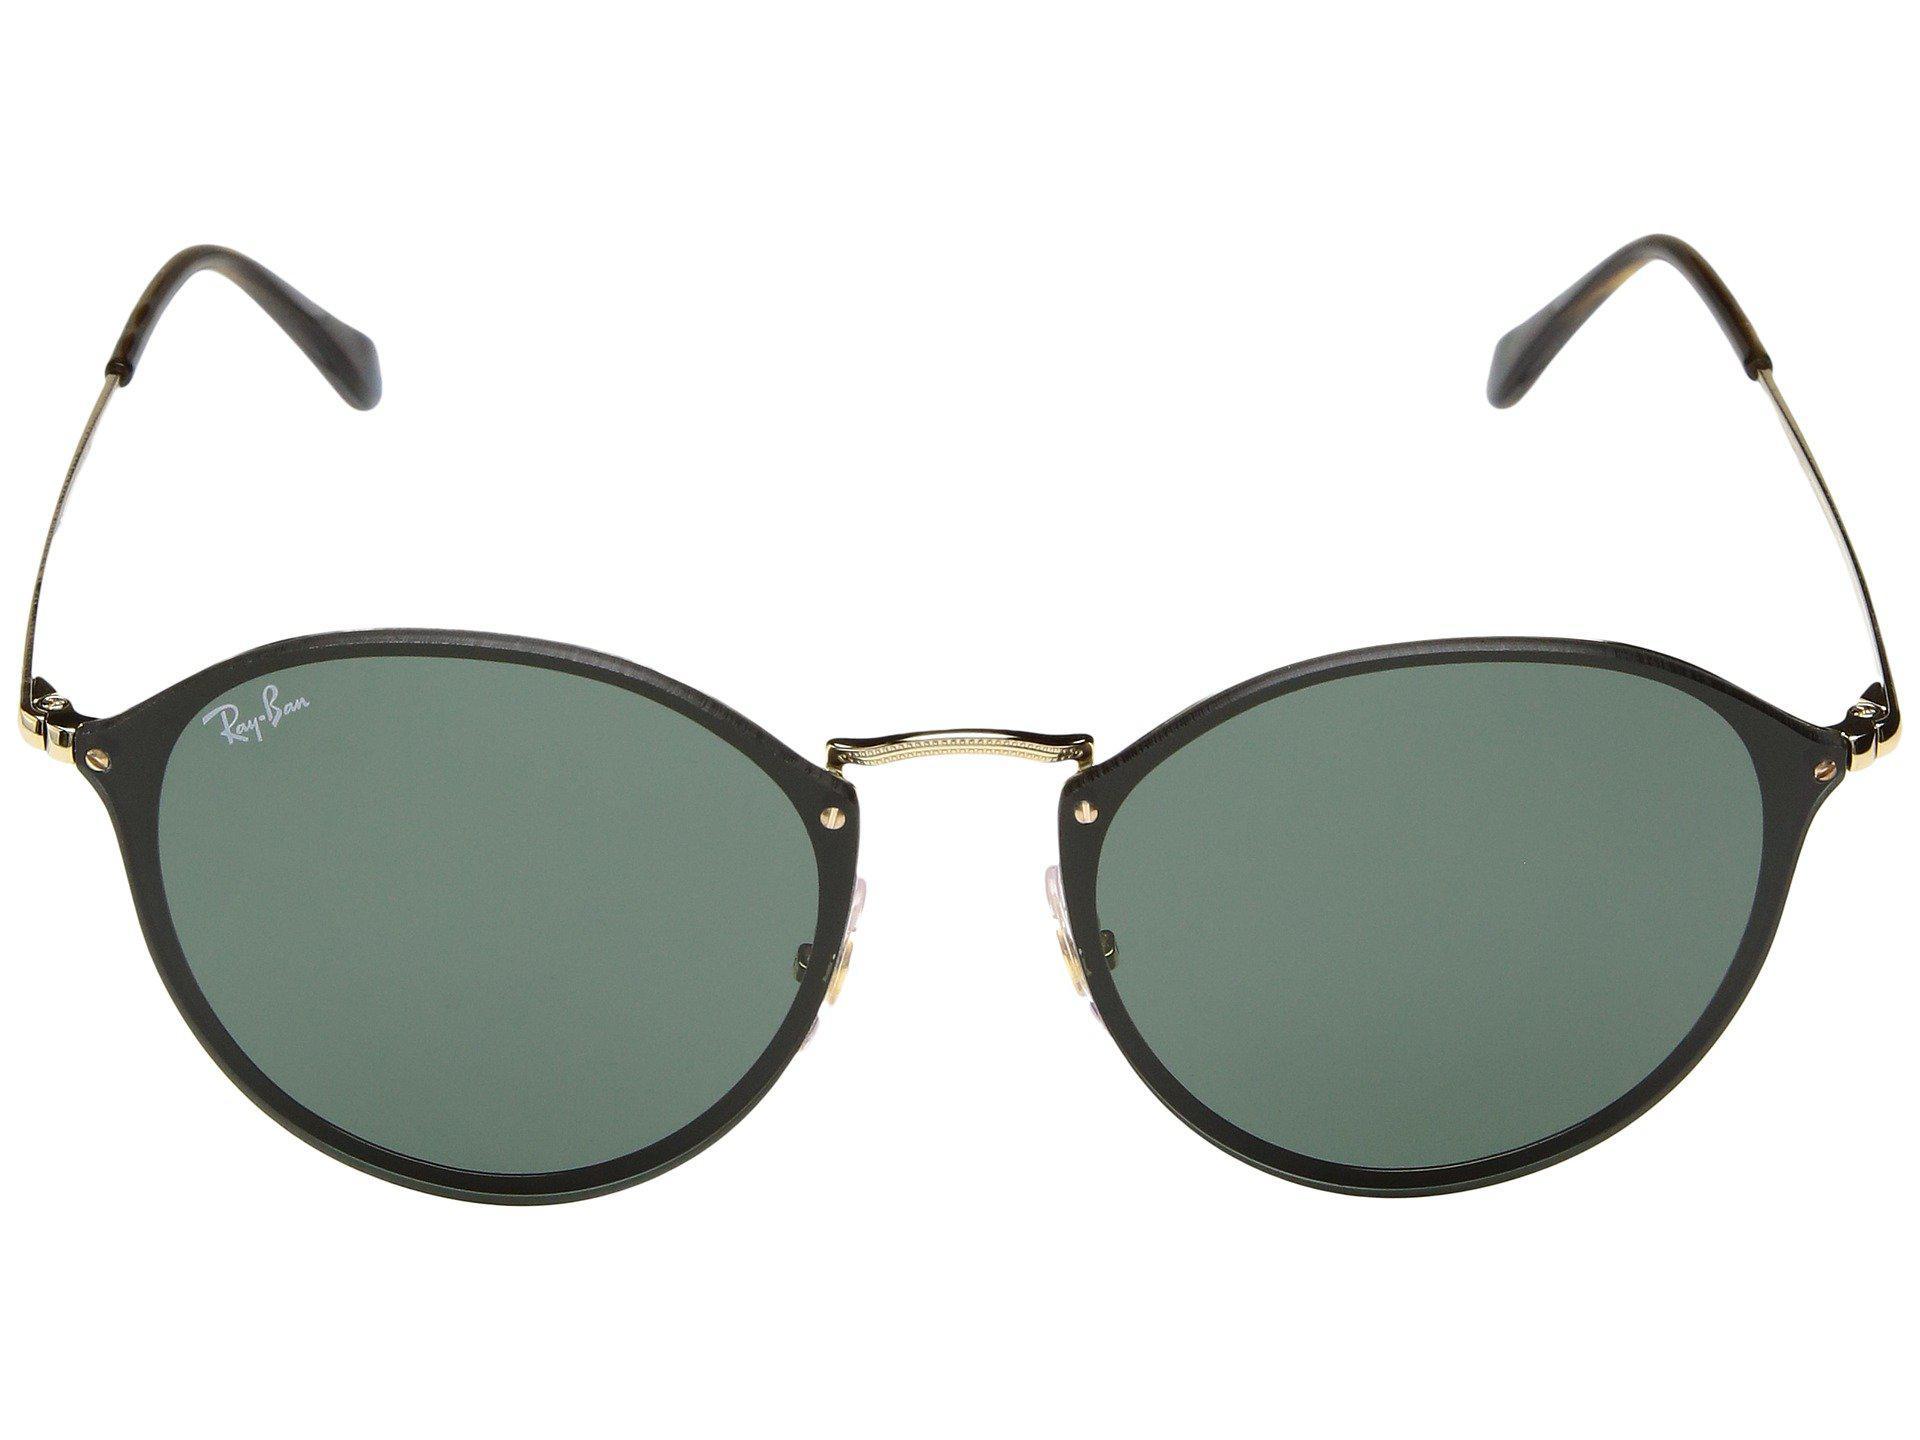 817bdeb424 Ray-Ban - Multicolor Blaze Round Rb3574n 59mm (gold green Classic) Fashion.  View fullscreen